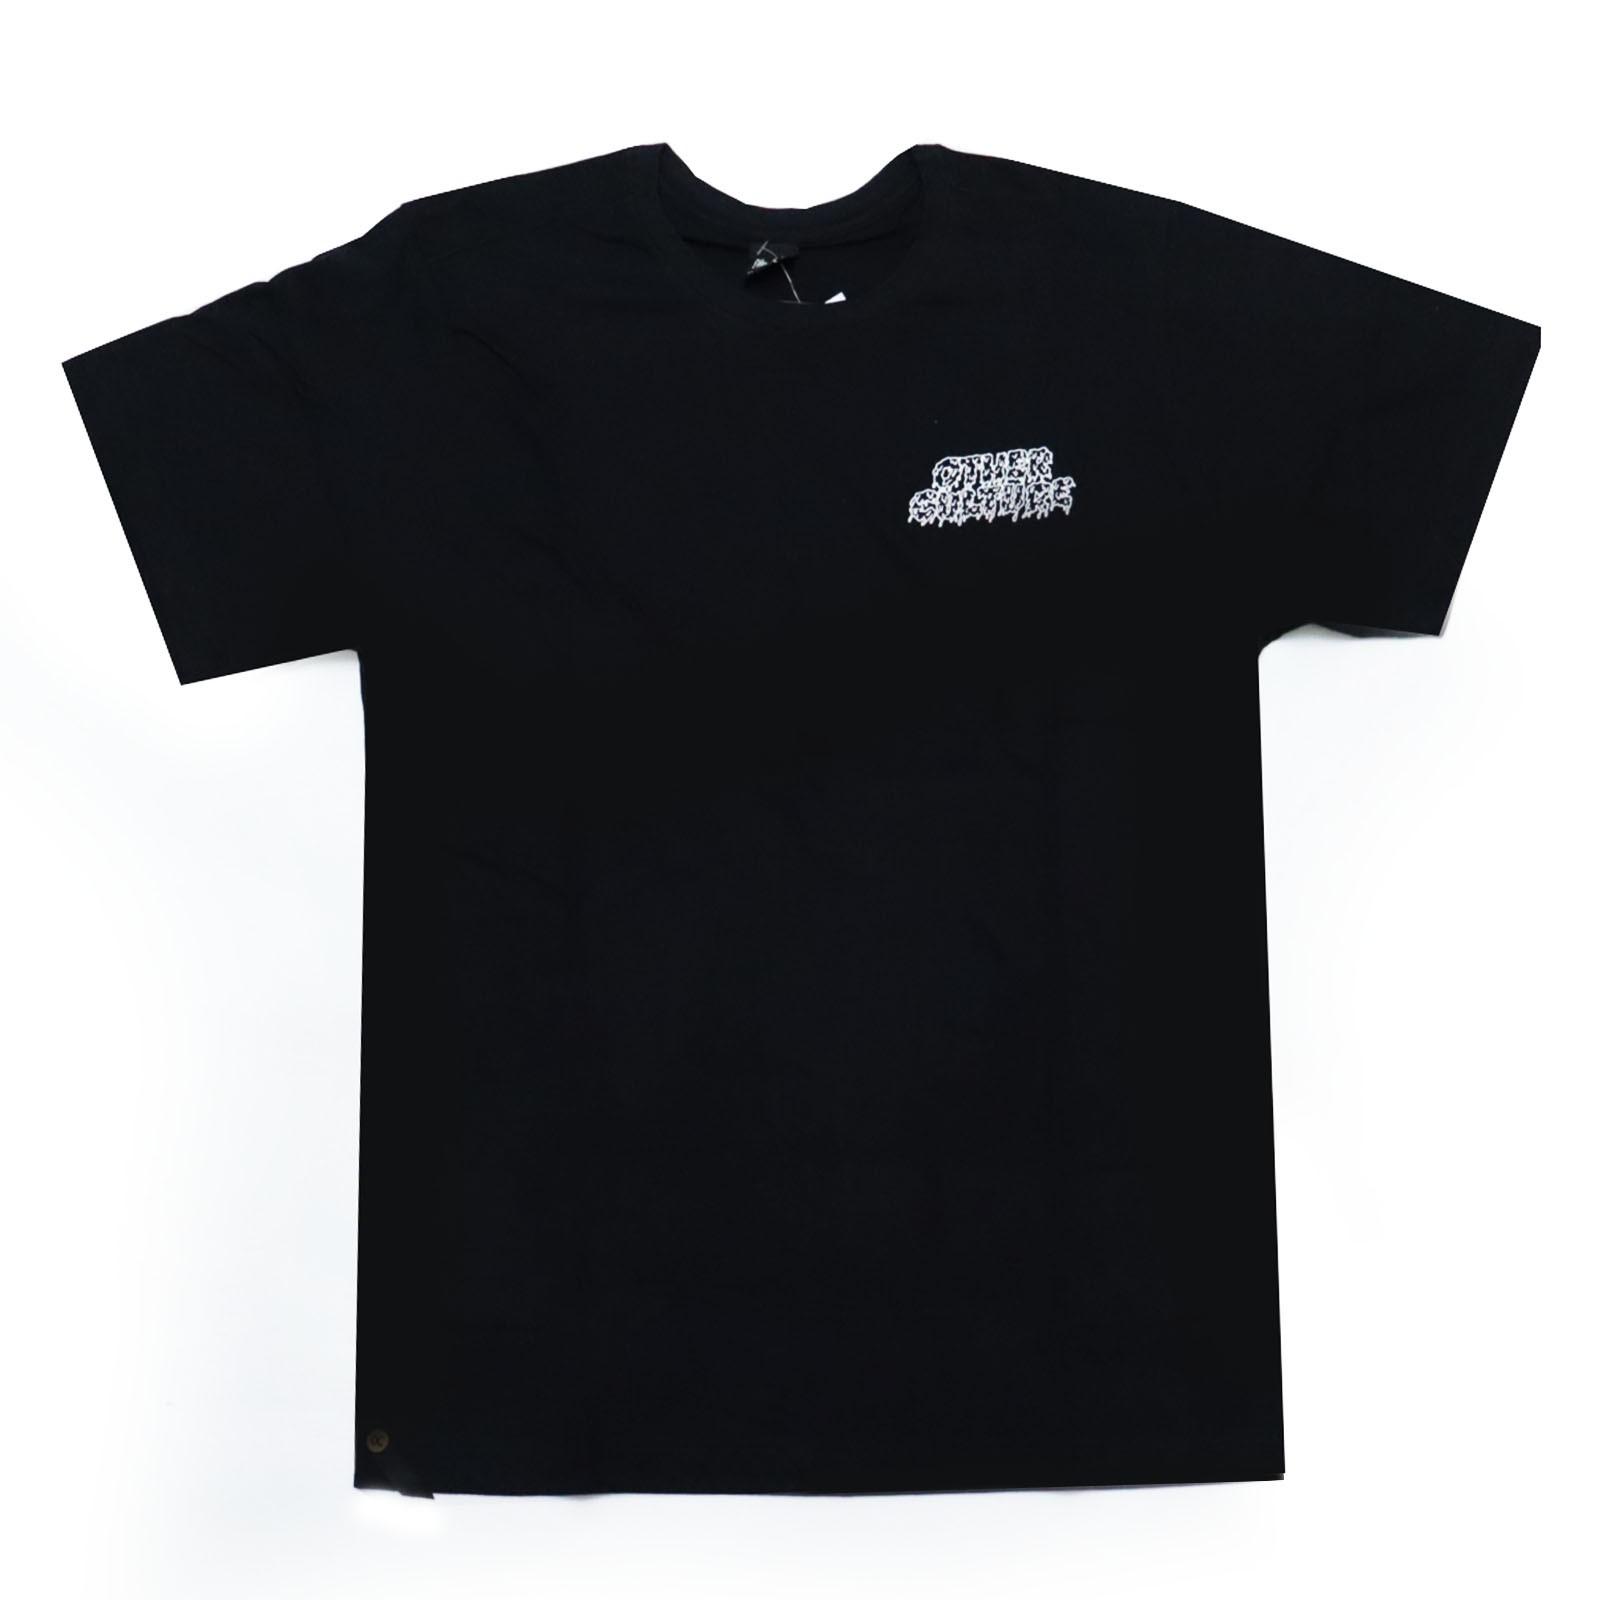 Camiseta Other Culture Smile - Preto